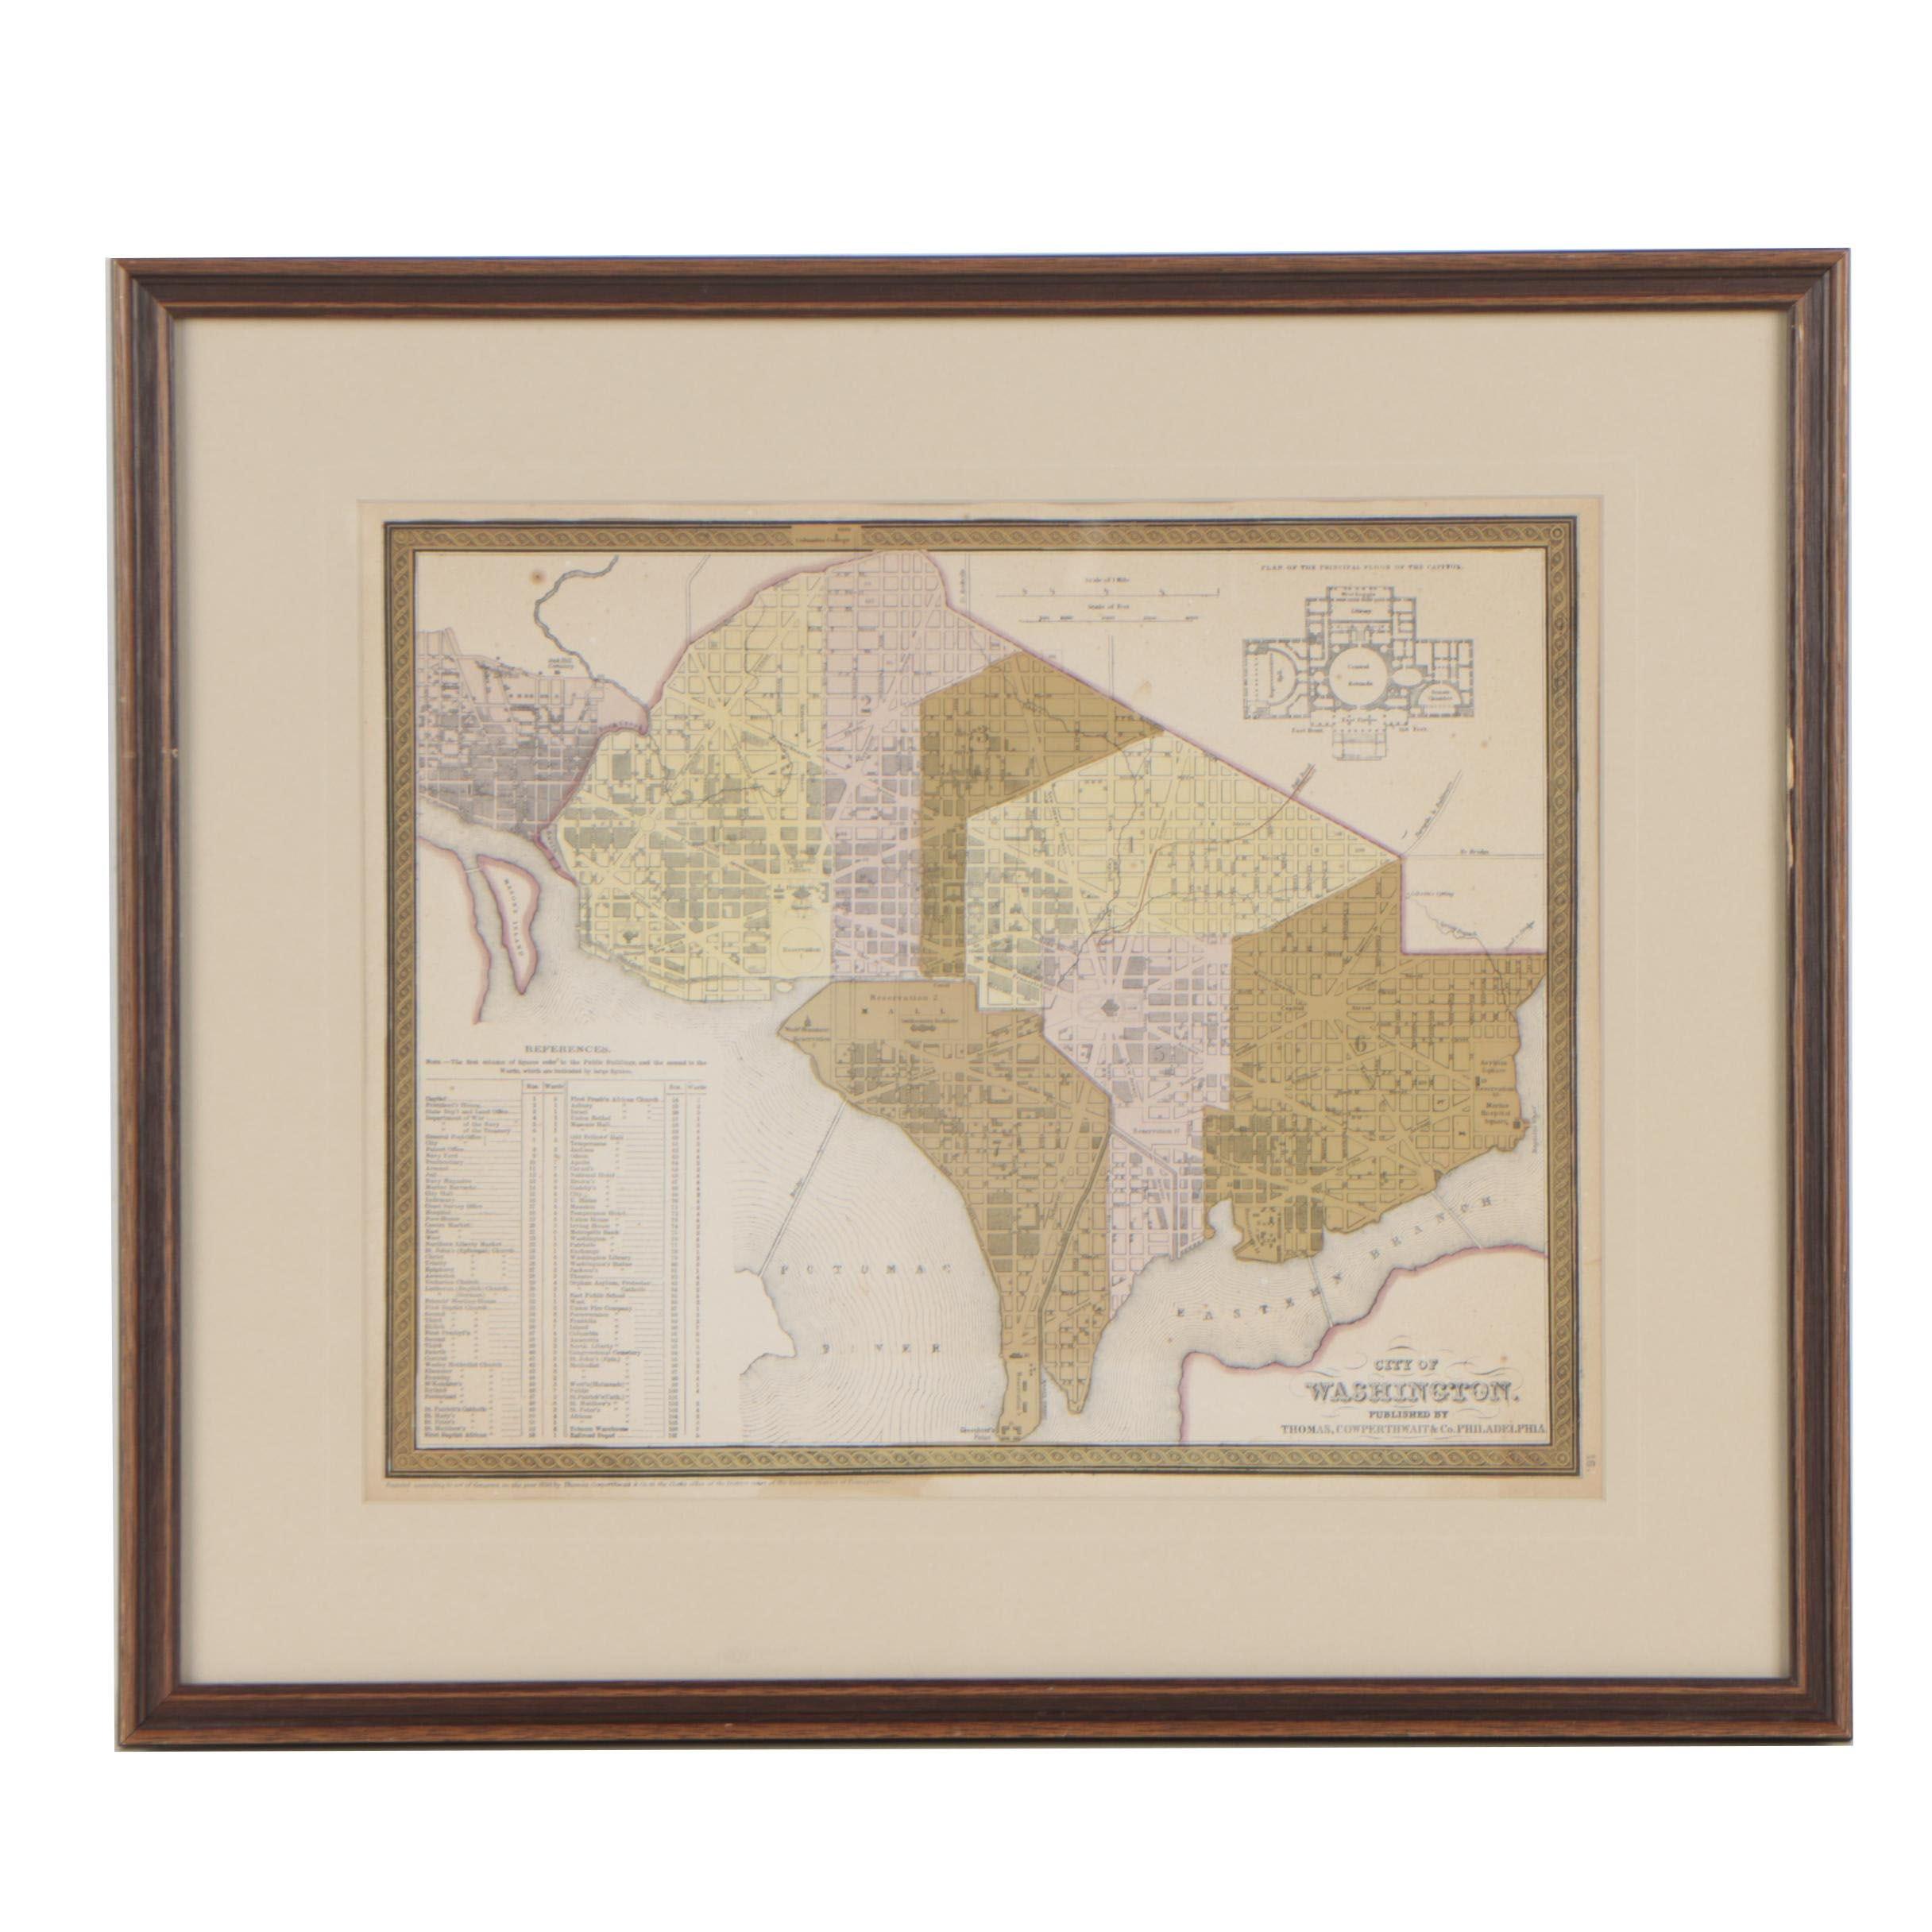 "Thomas, Cowperthwait & Co. Hand-Colored Map ""City of Washington"""